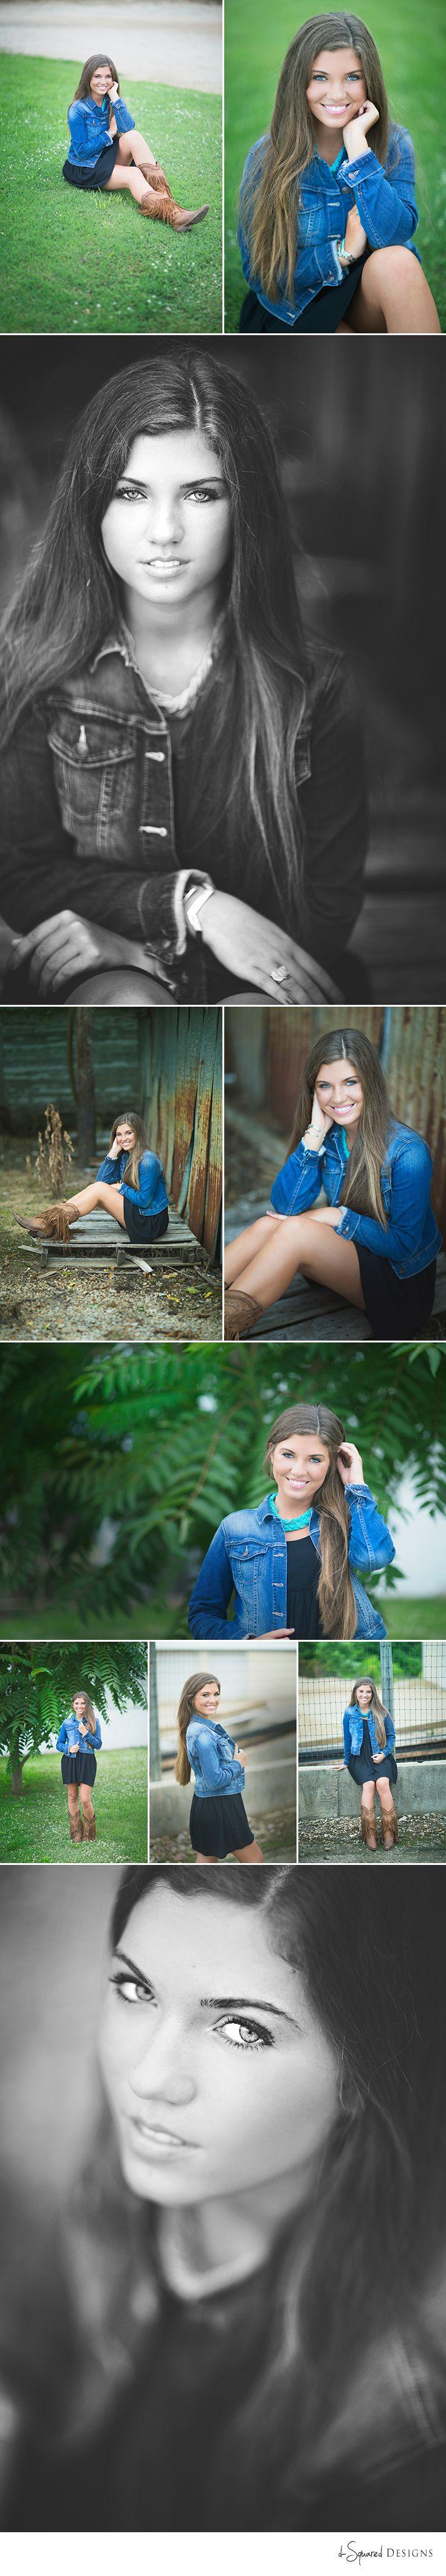 d-Squared Designs St. Louis, Missouri Senior Photography. Gorgeous brunette. Jean jacket with dress style. Cute boots. Senior girl photography. Senior girl posing. Senior inspiration.